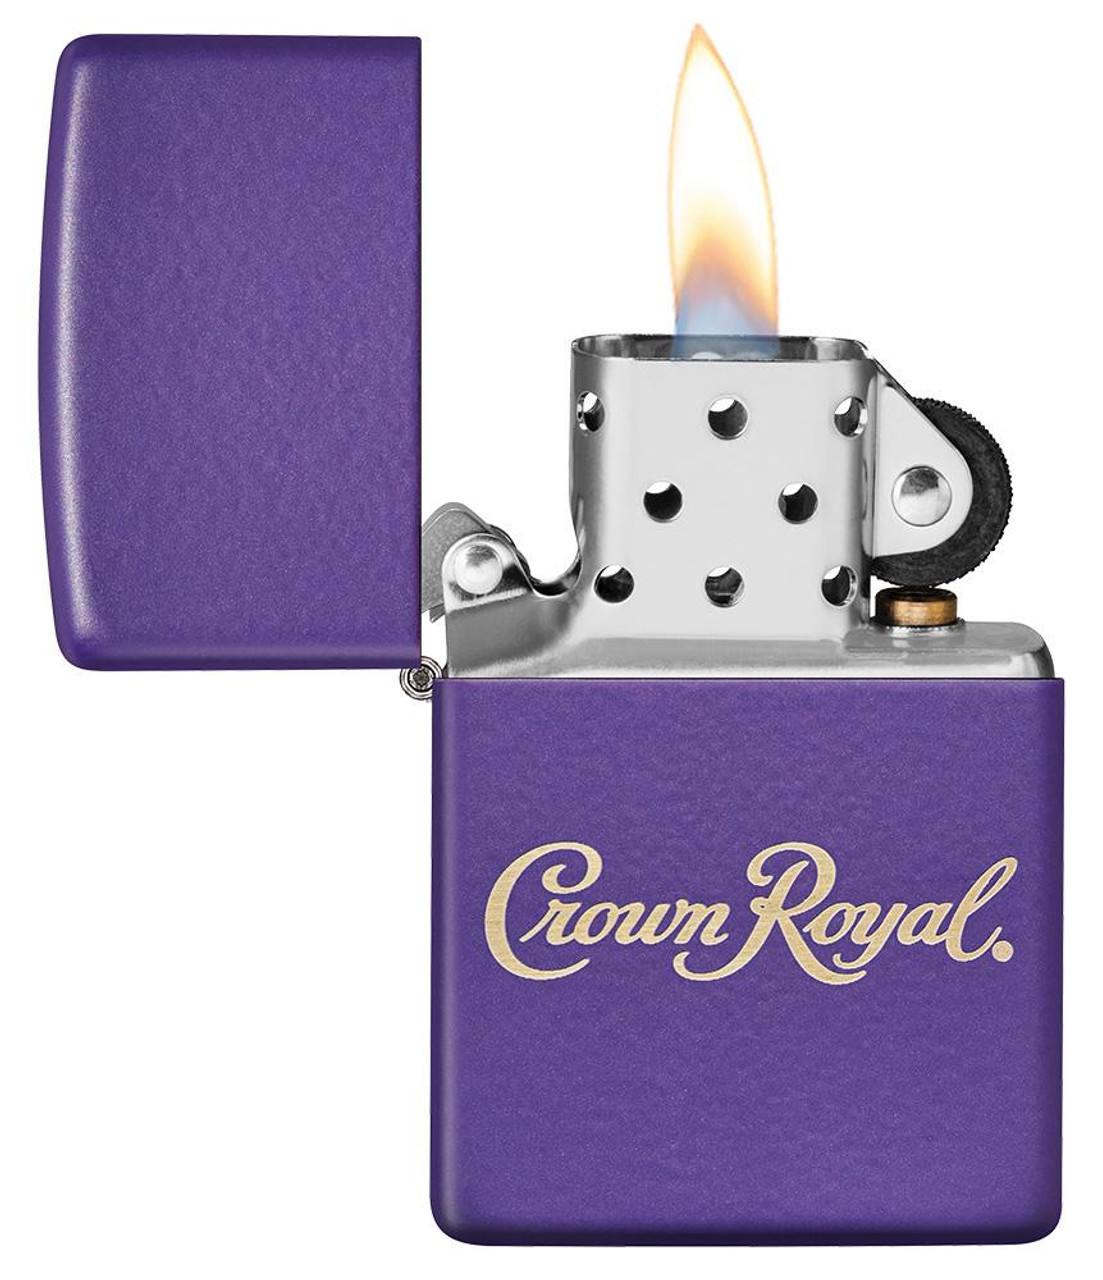 Zippo 49460-000003 Crown Royal Lighter